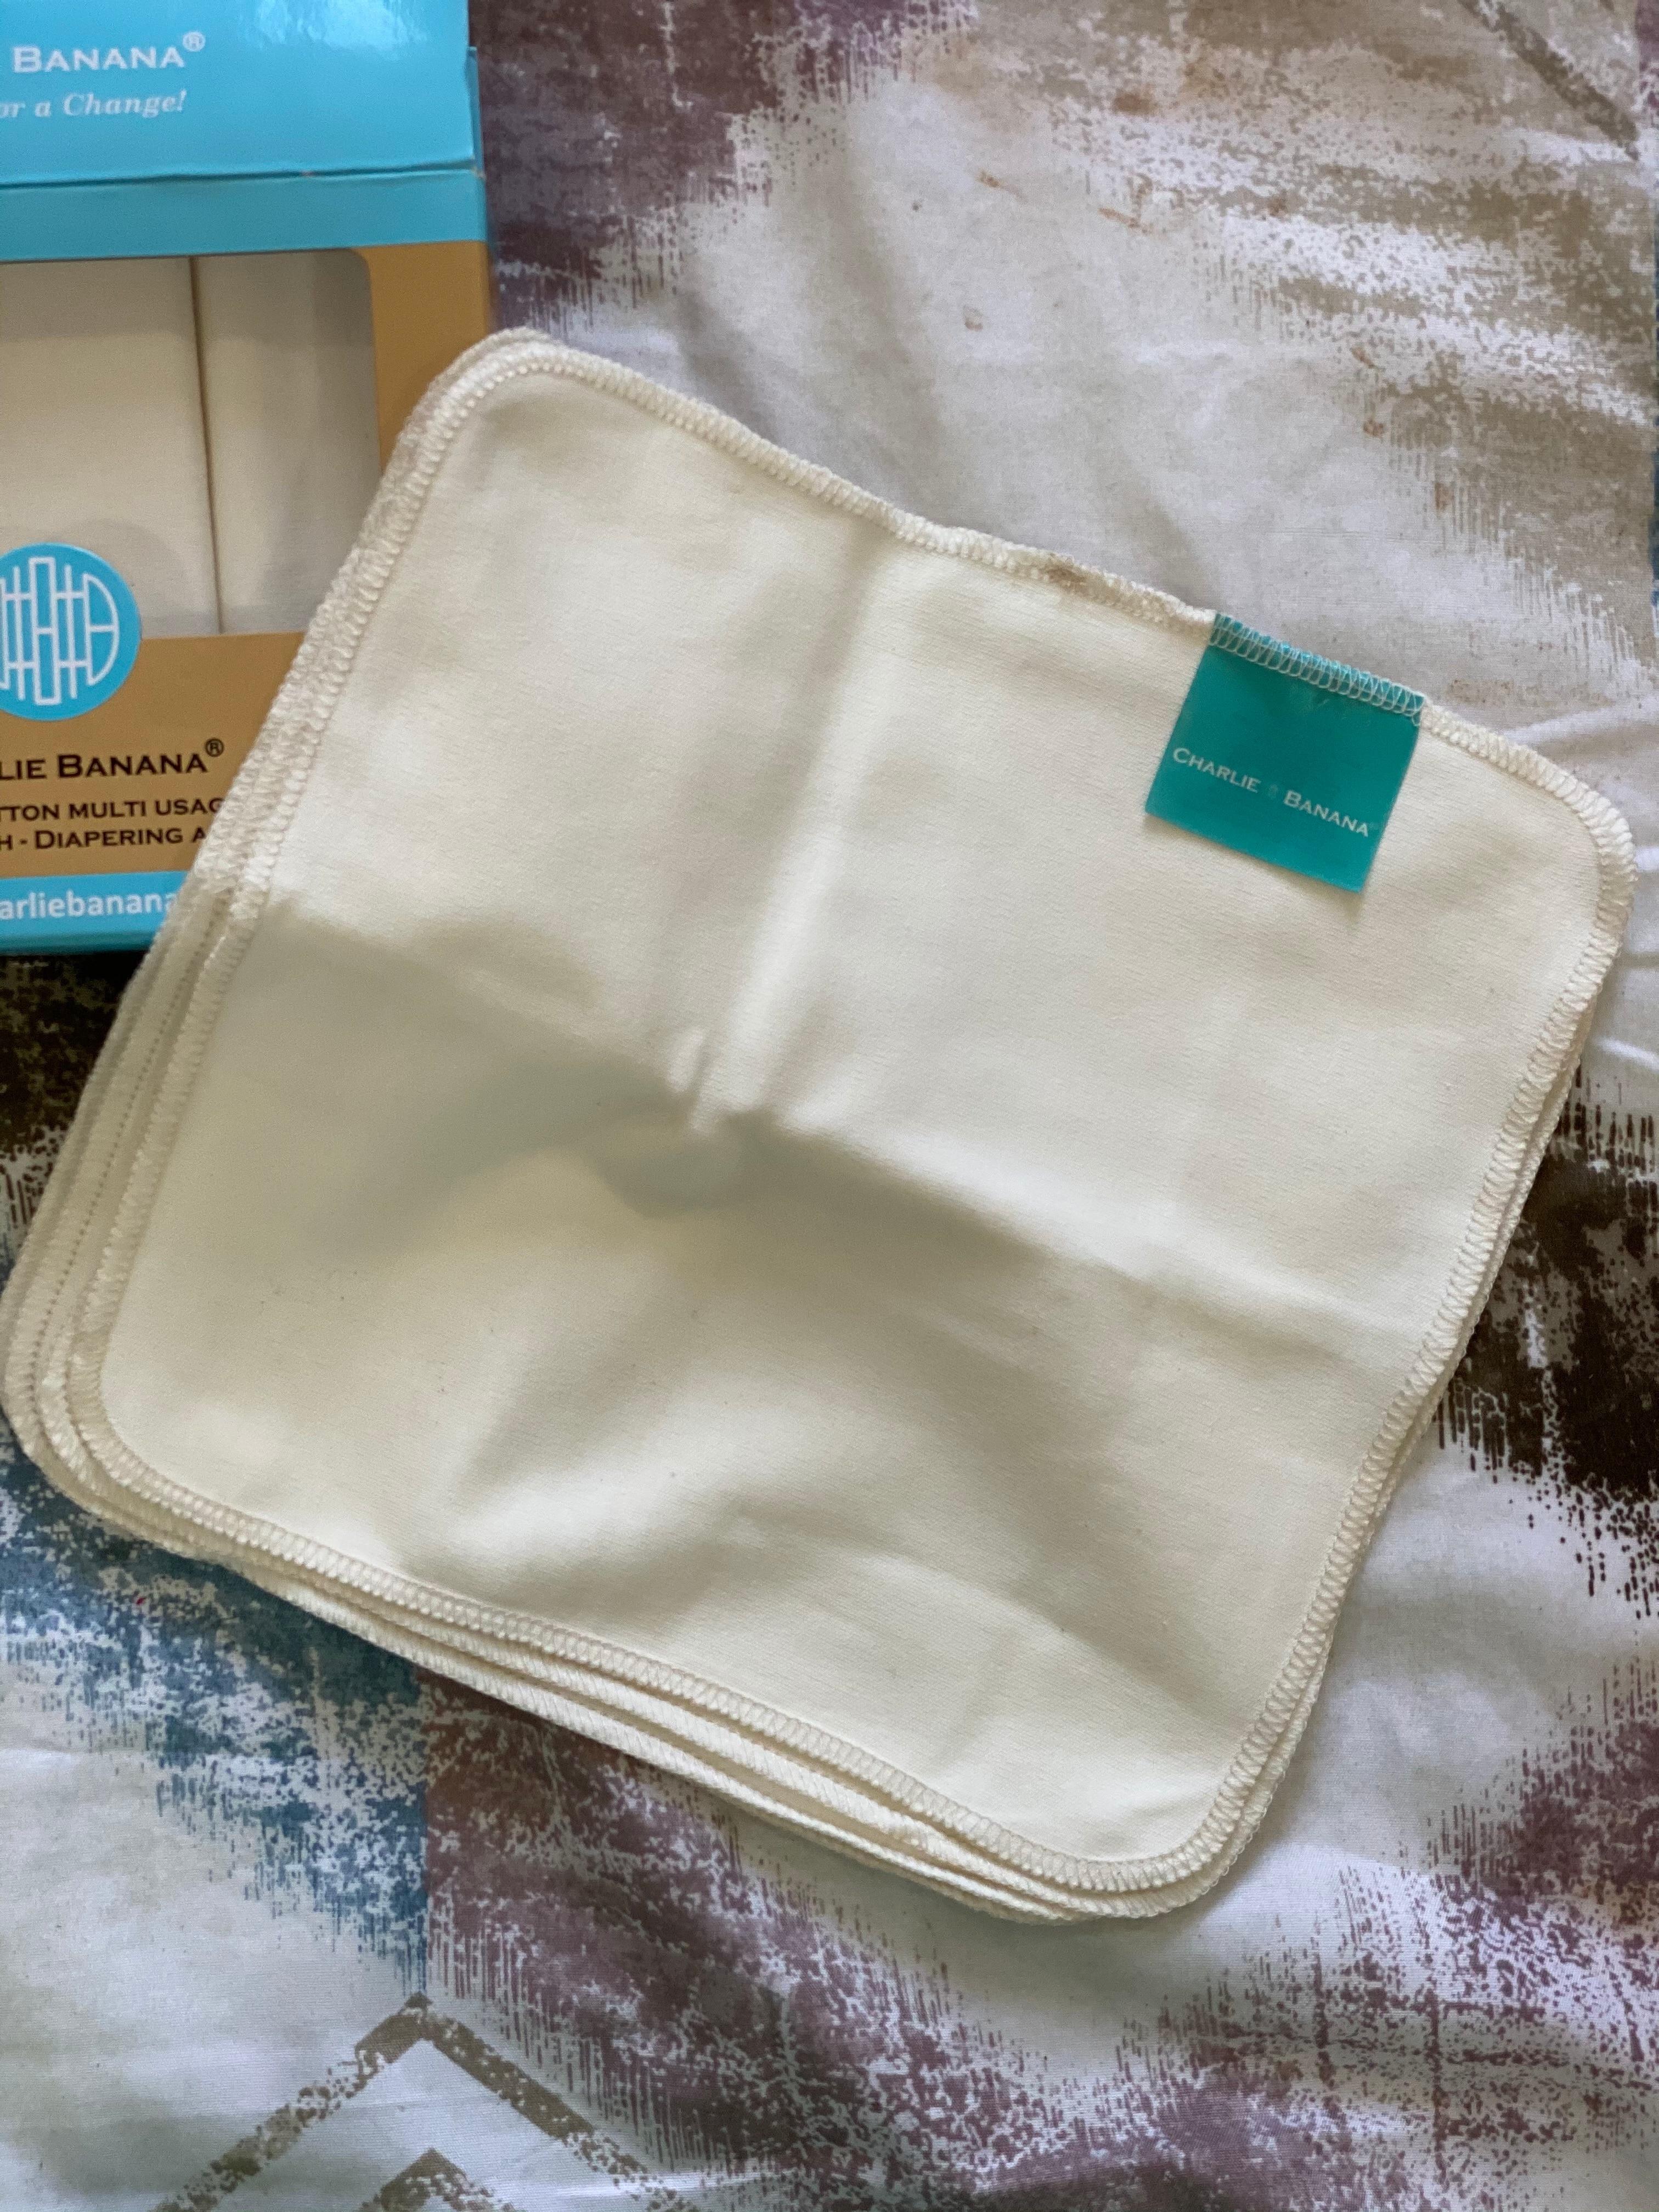 Charlie Banana Reusable Organic Cotton Wipes-Wonderful quality-By shwetac15